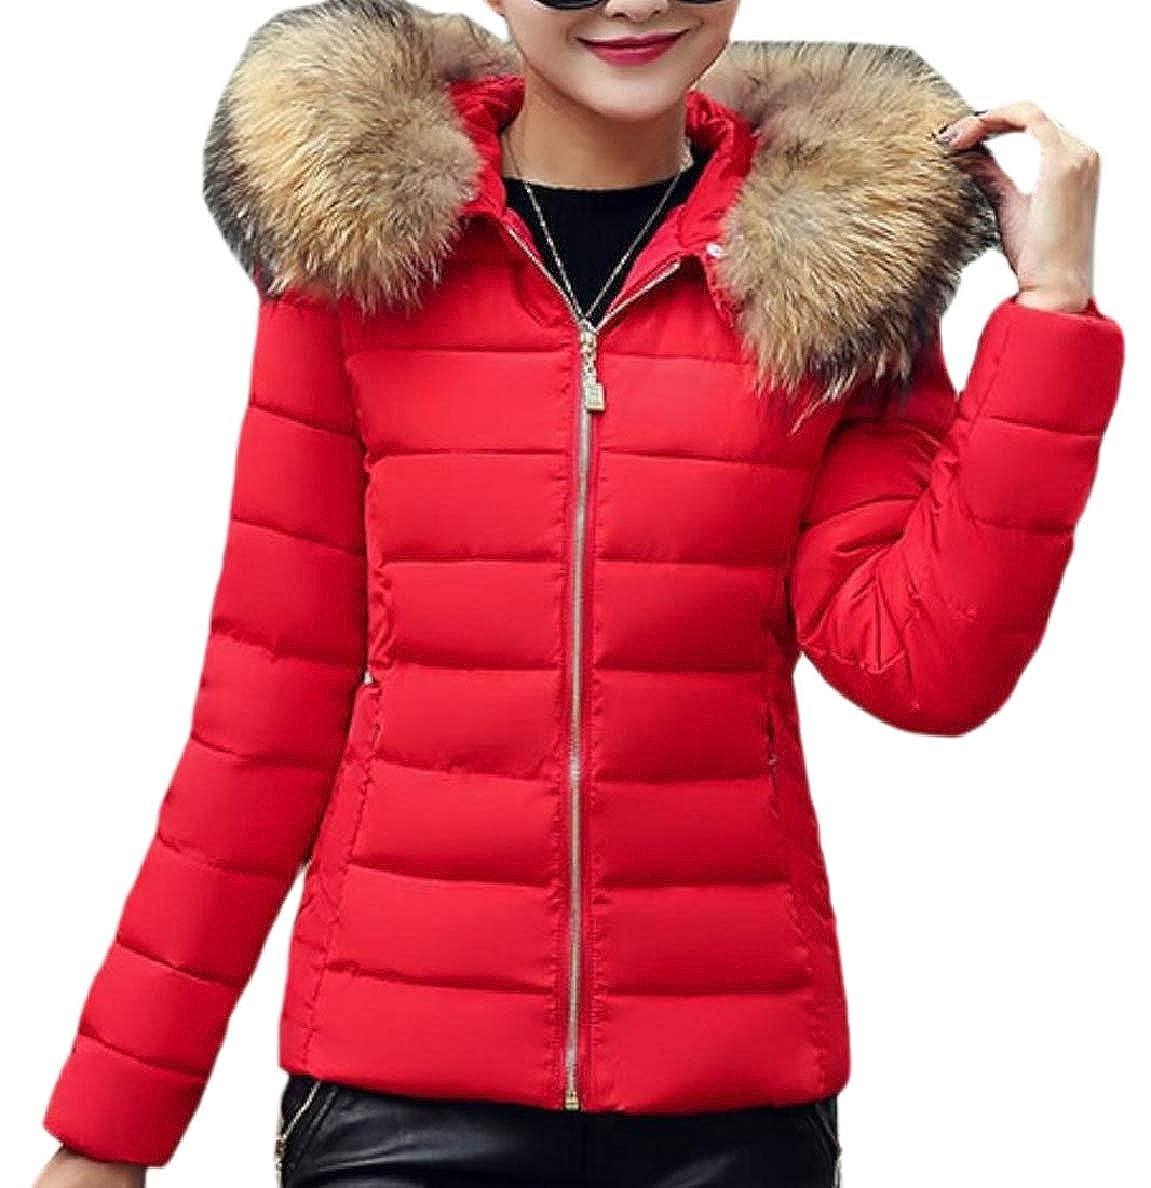 2 Xswsy XGCA Womens Down Peacoat Zipper Faux Fur Hood Casual Puffer Jackets